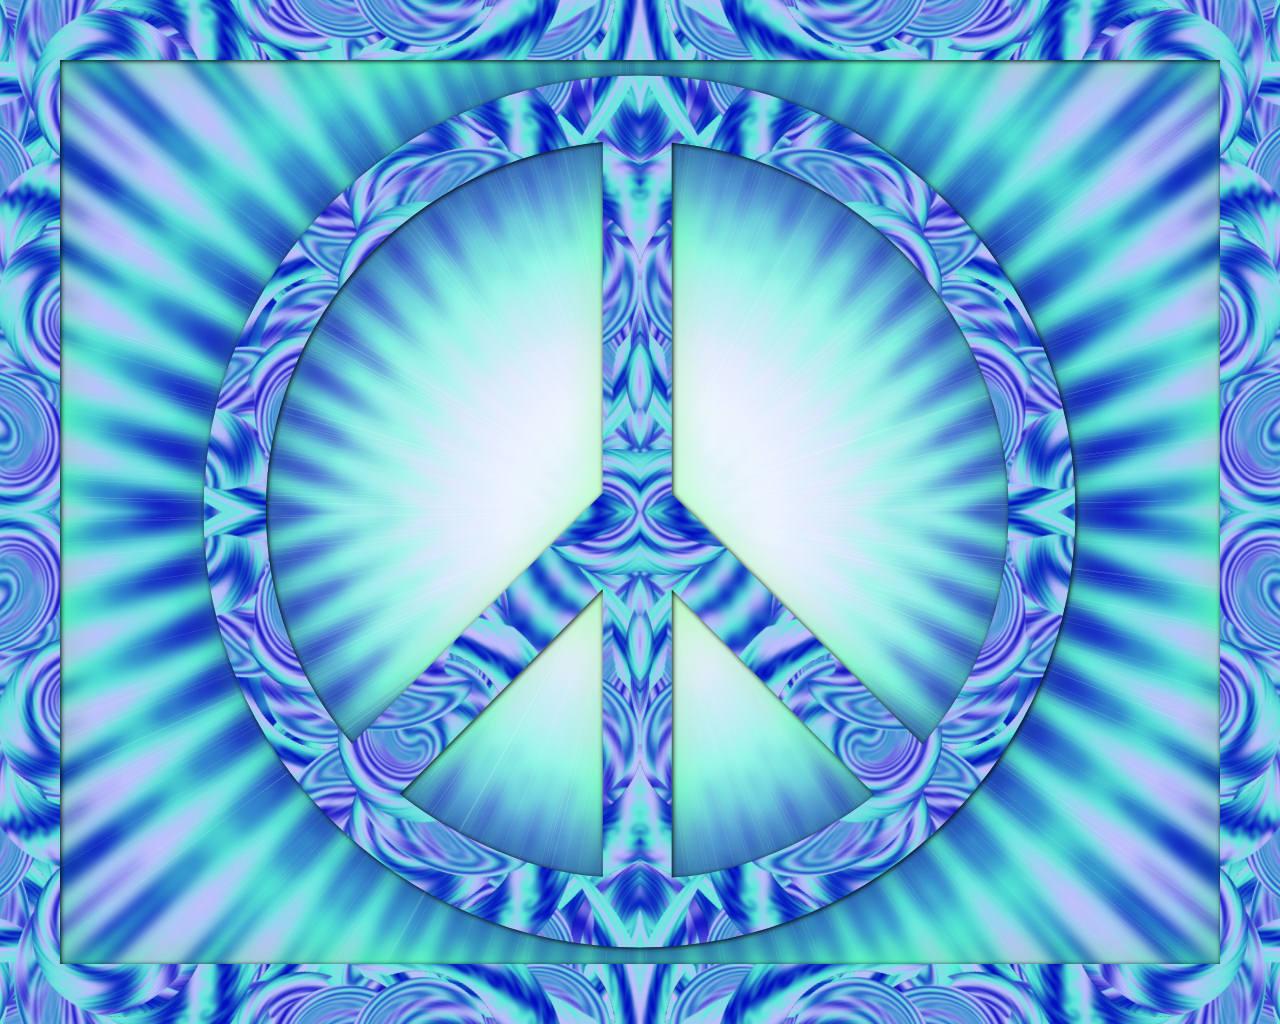 peace symbol1jpg 12801024 1280x1024